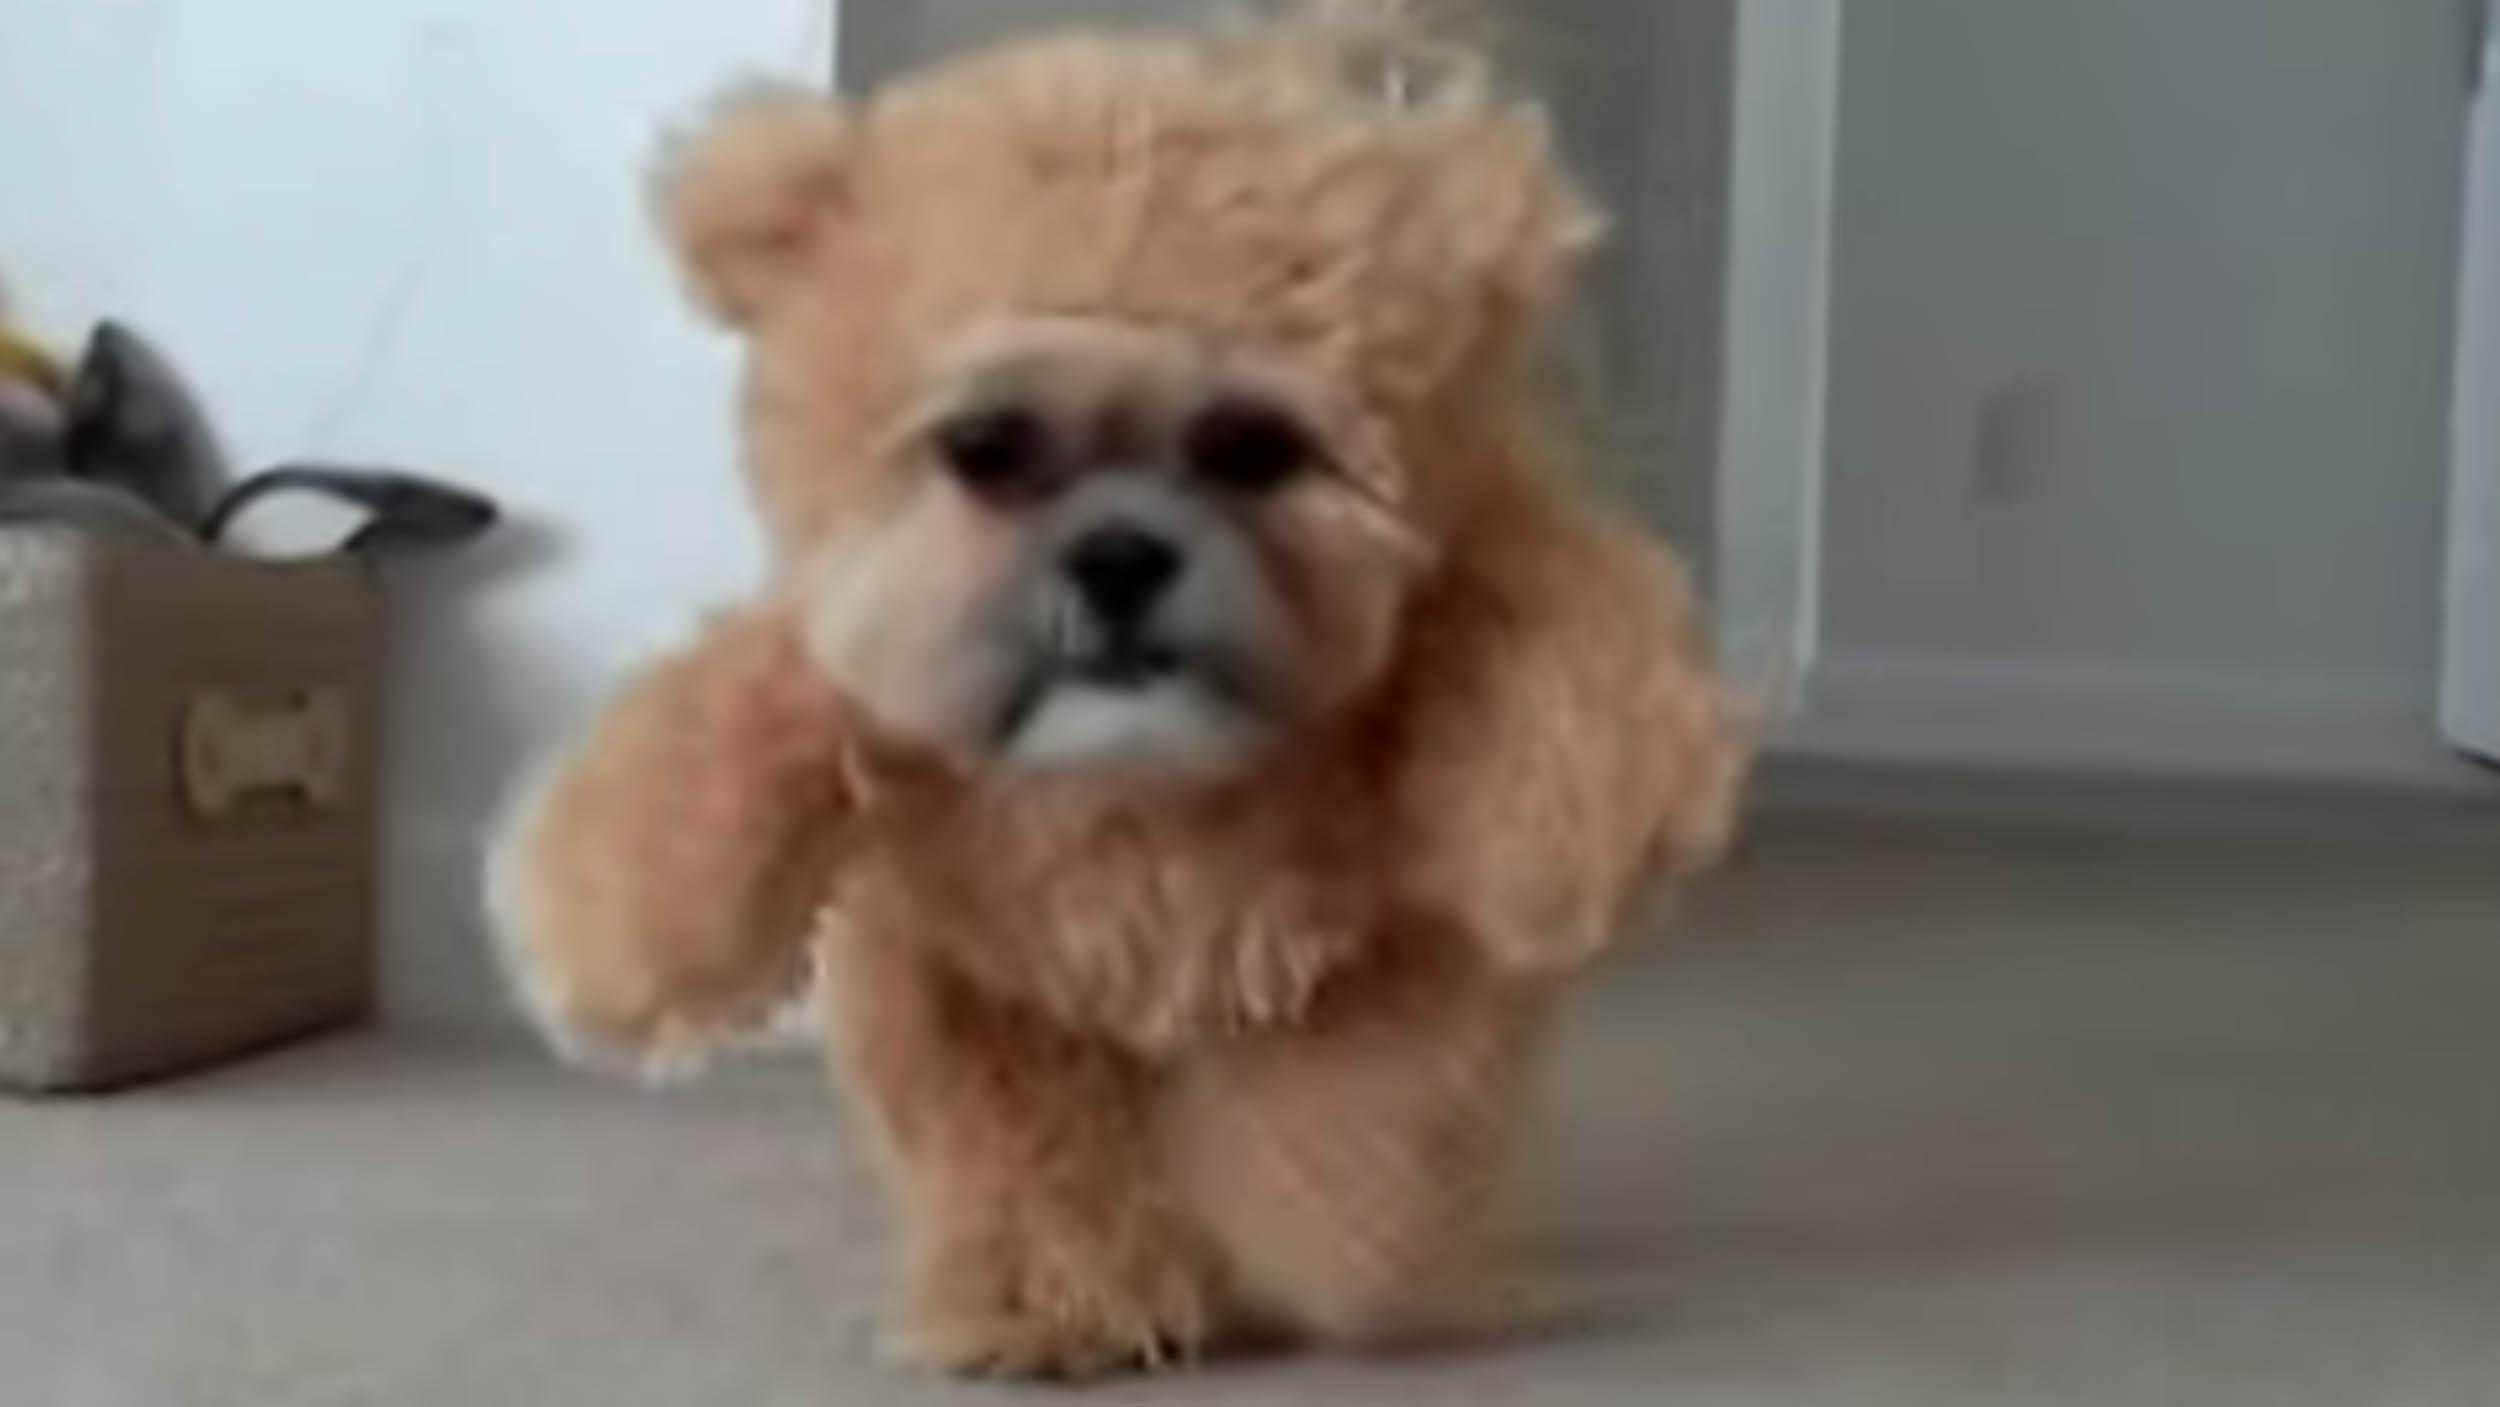 Munchkin the Shih Tzu won Halloween in this teddy bear costume - TODAY.com